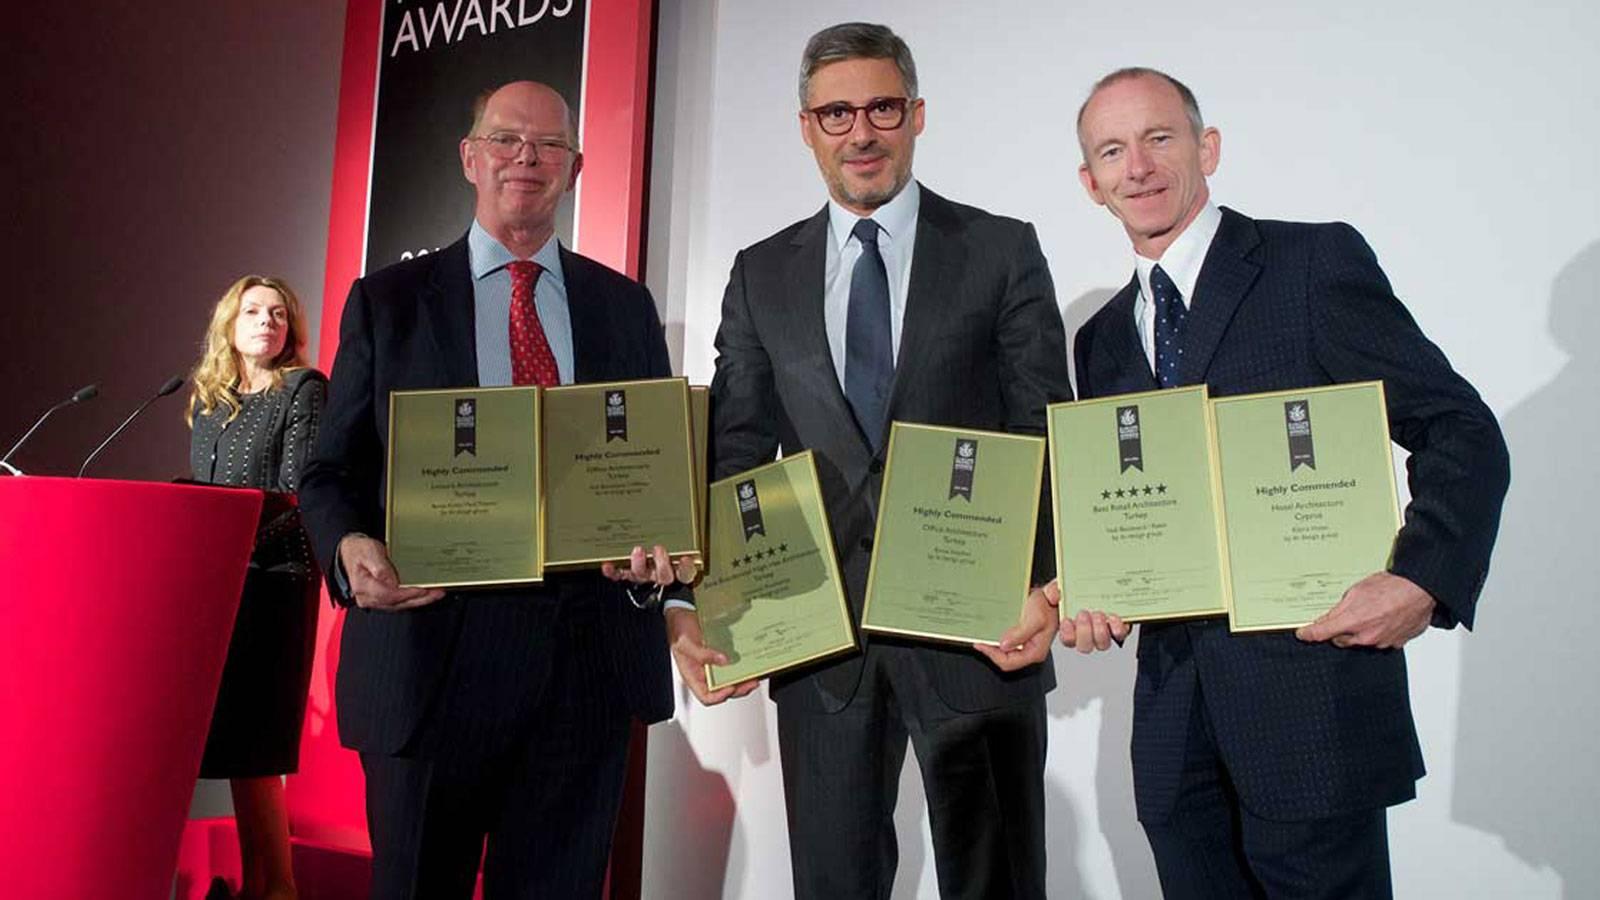 iki design group receives multiple awards from International Property Awards